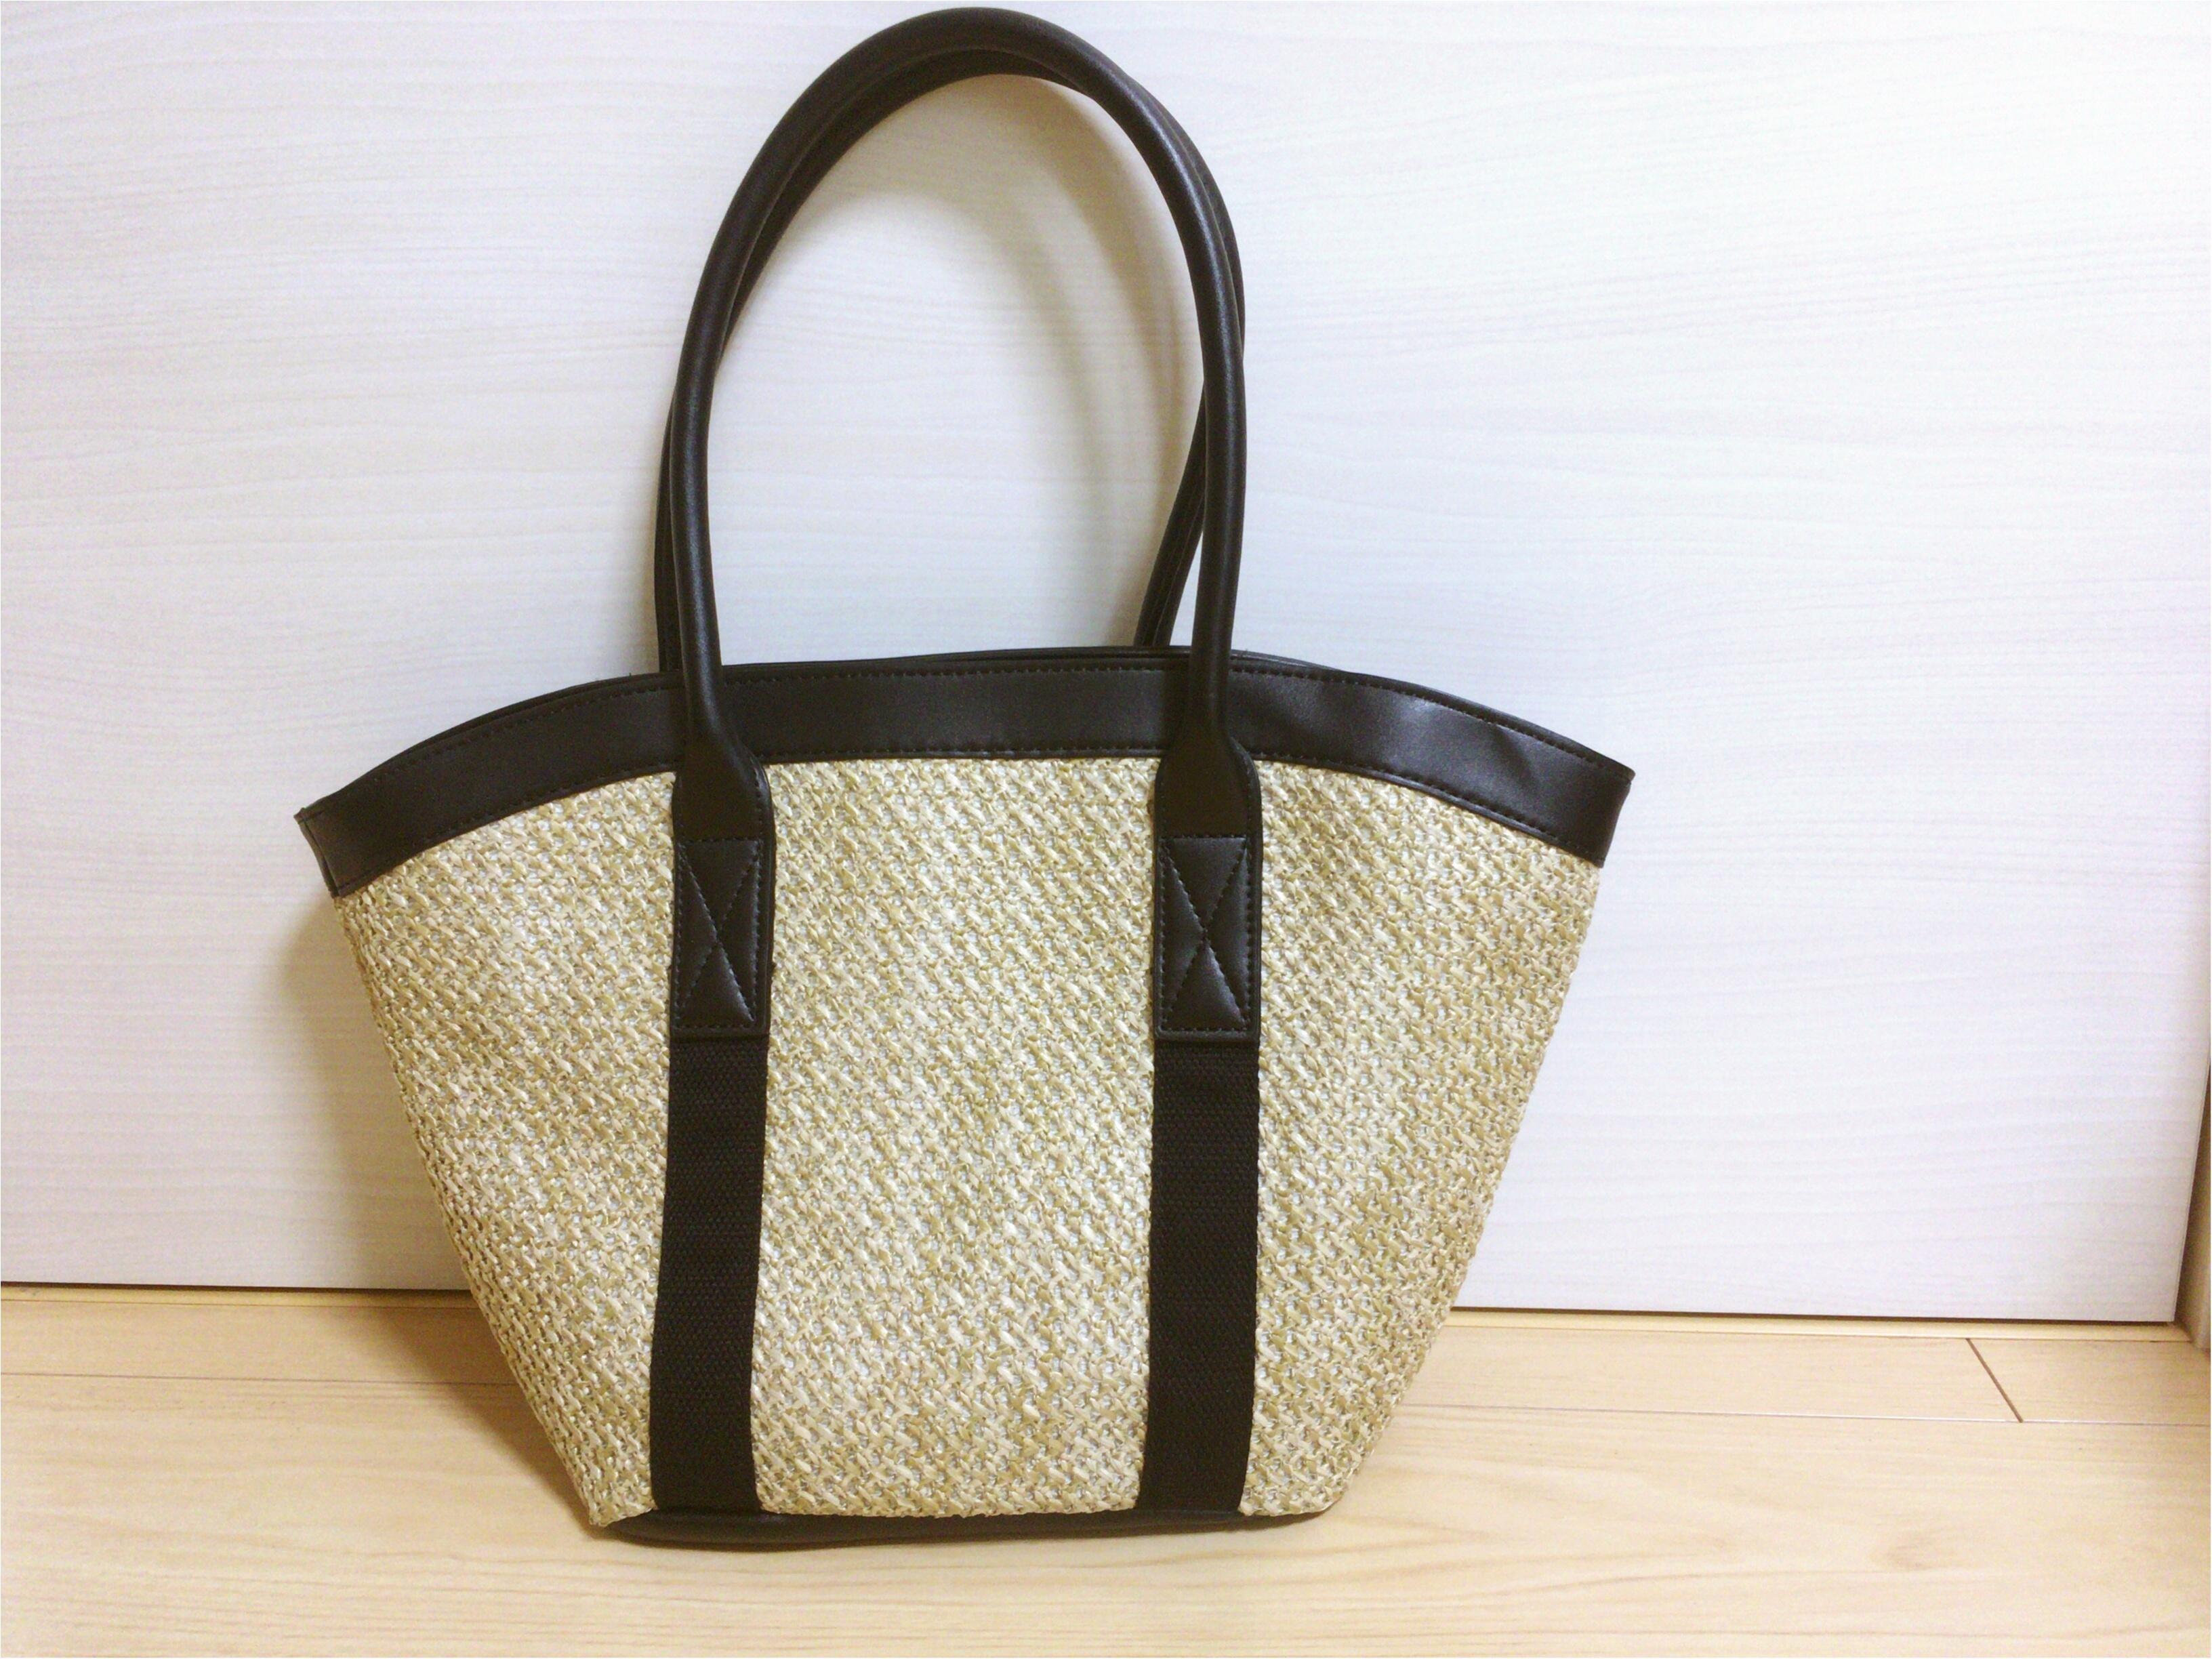 【SALE】990円!GU《カゴトートバッグ》可愛い♡夏ファッション必須アイテムをさらに安く♡_2